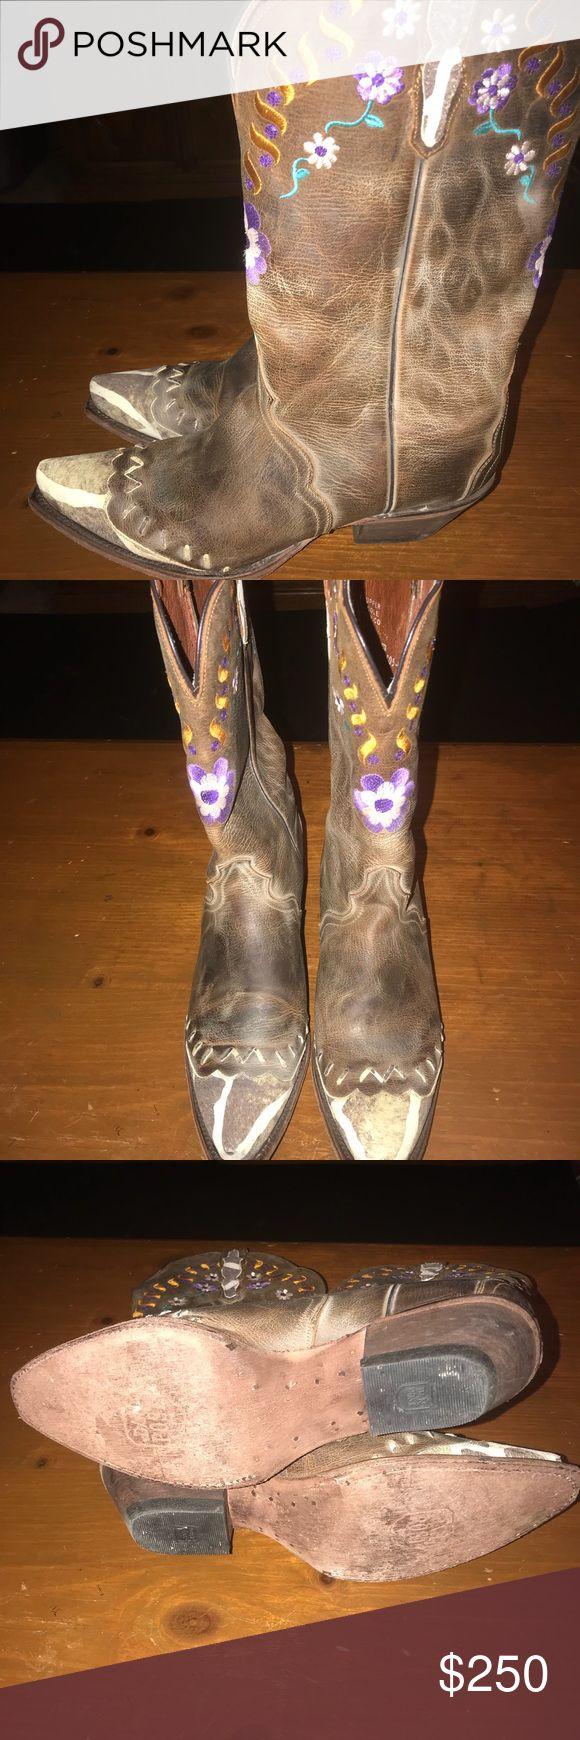 Size 10 Dan post boots! Worn 1 time super cute Dan post size 10 flower boots! Super cute western style! Dan Post Shoes Heeled Boots